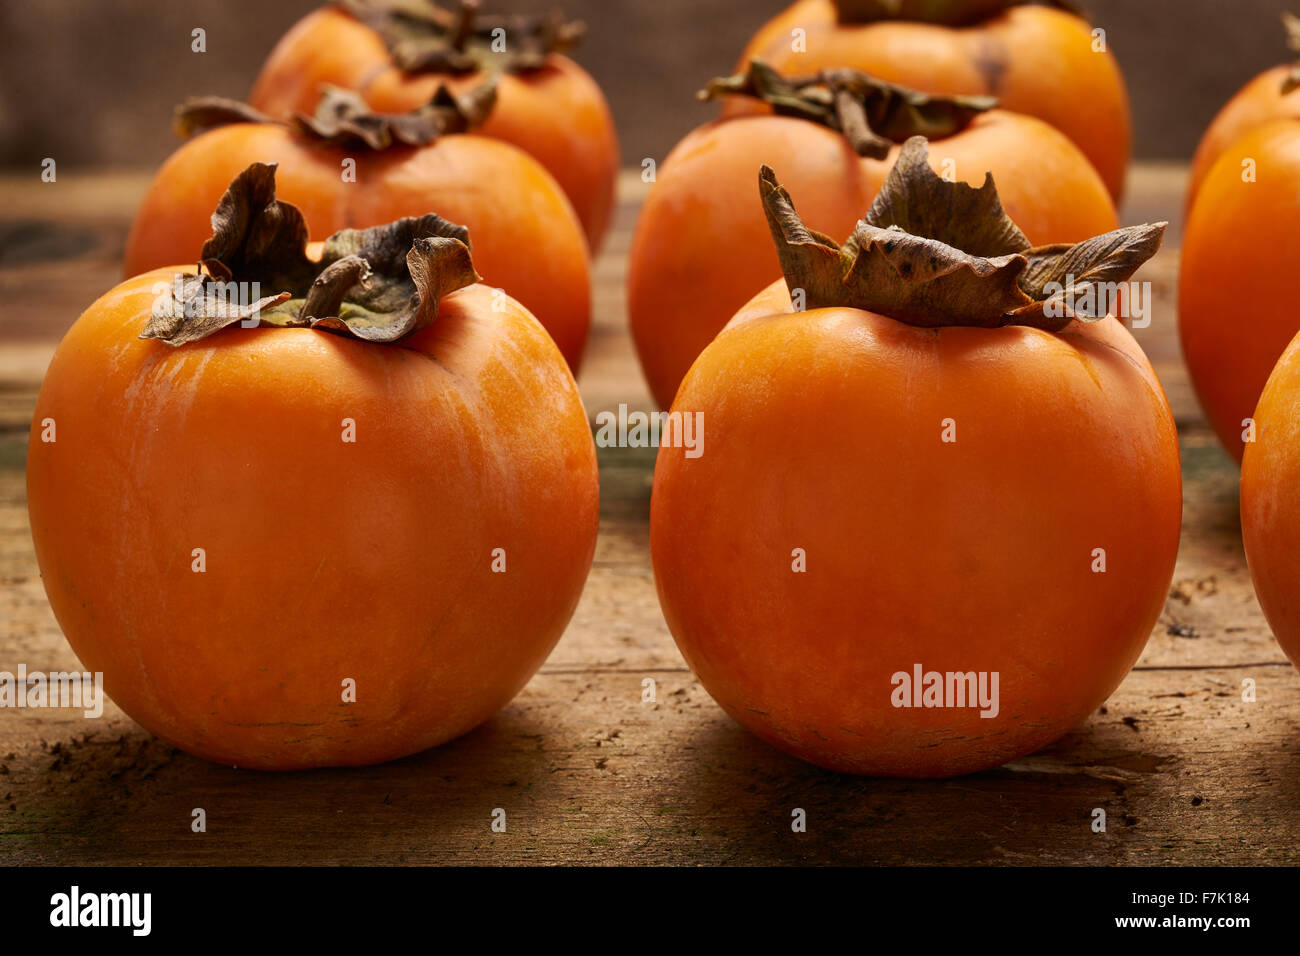 Yummy naranja caquis apuntalado una mesa de madera antigua Imagen De Stock